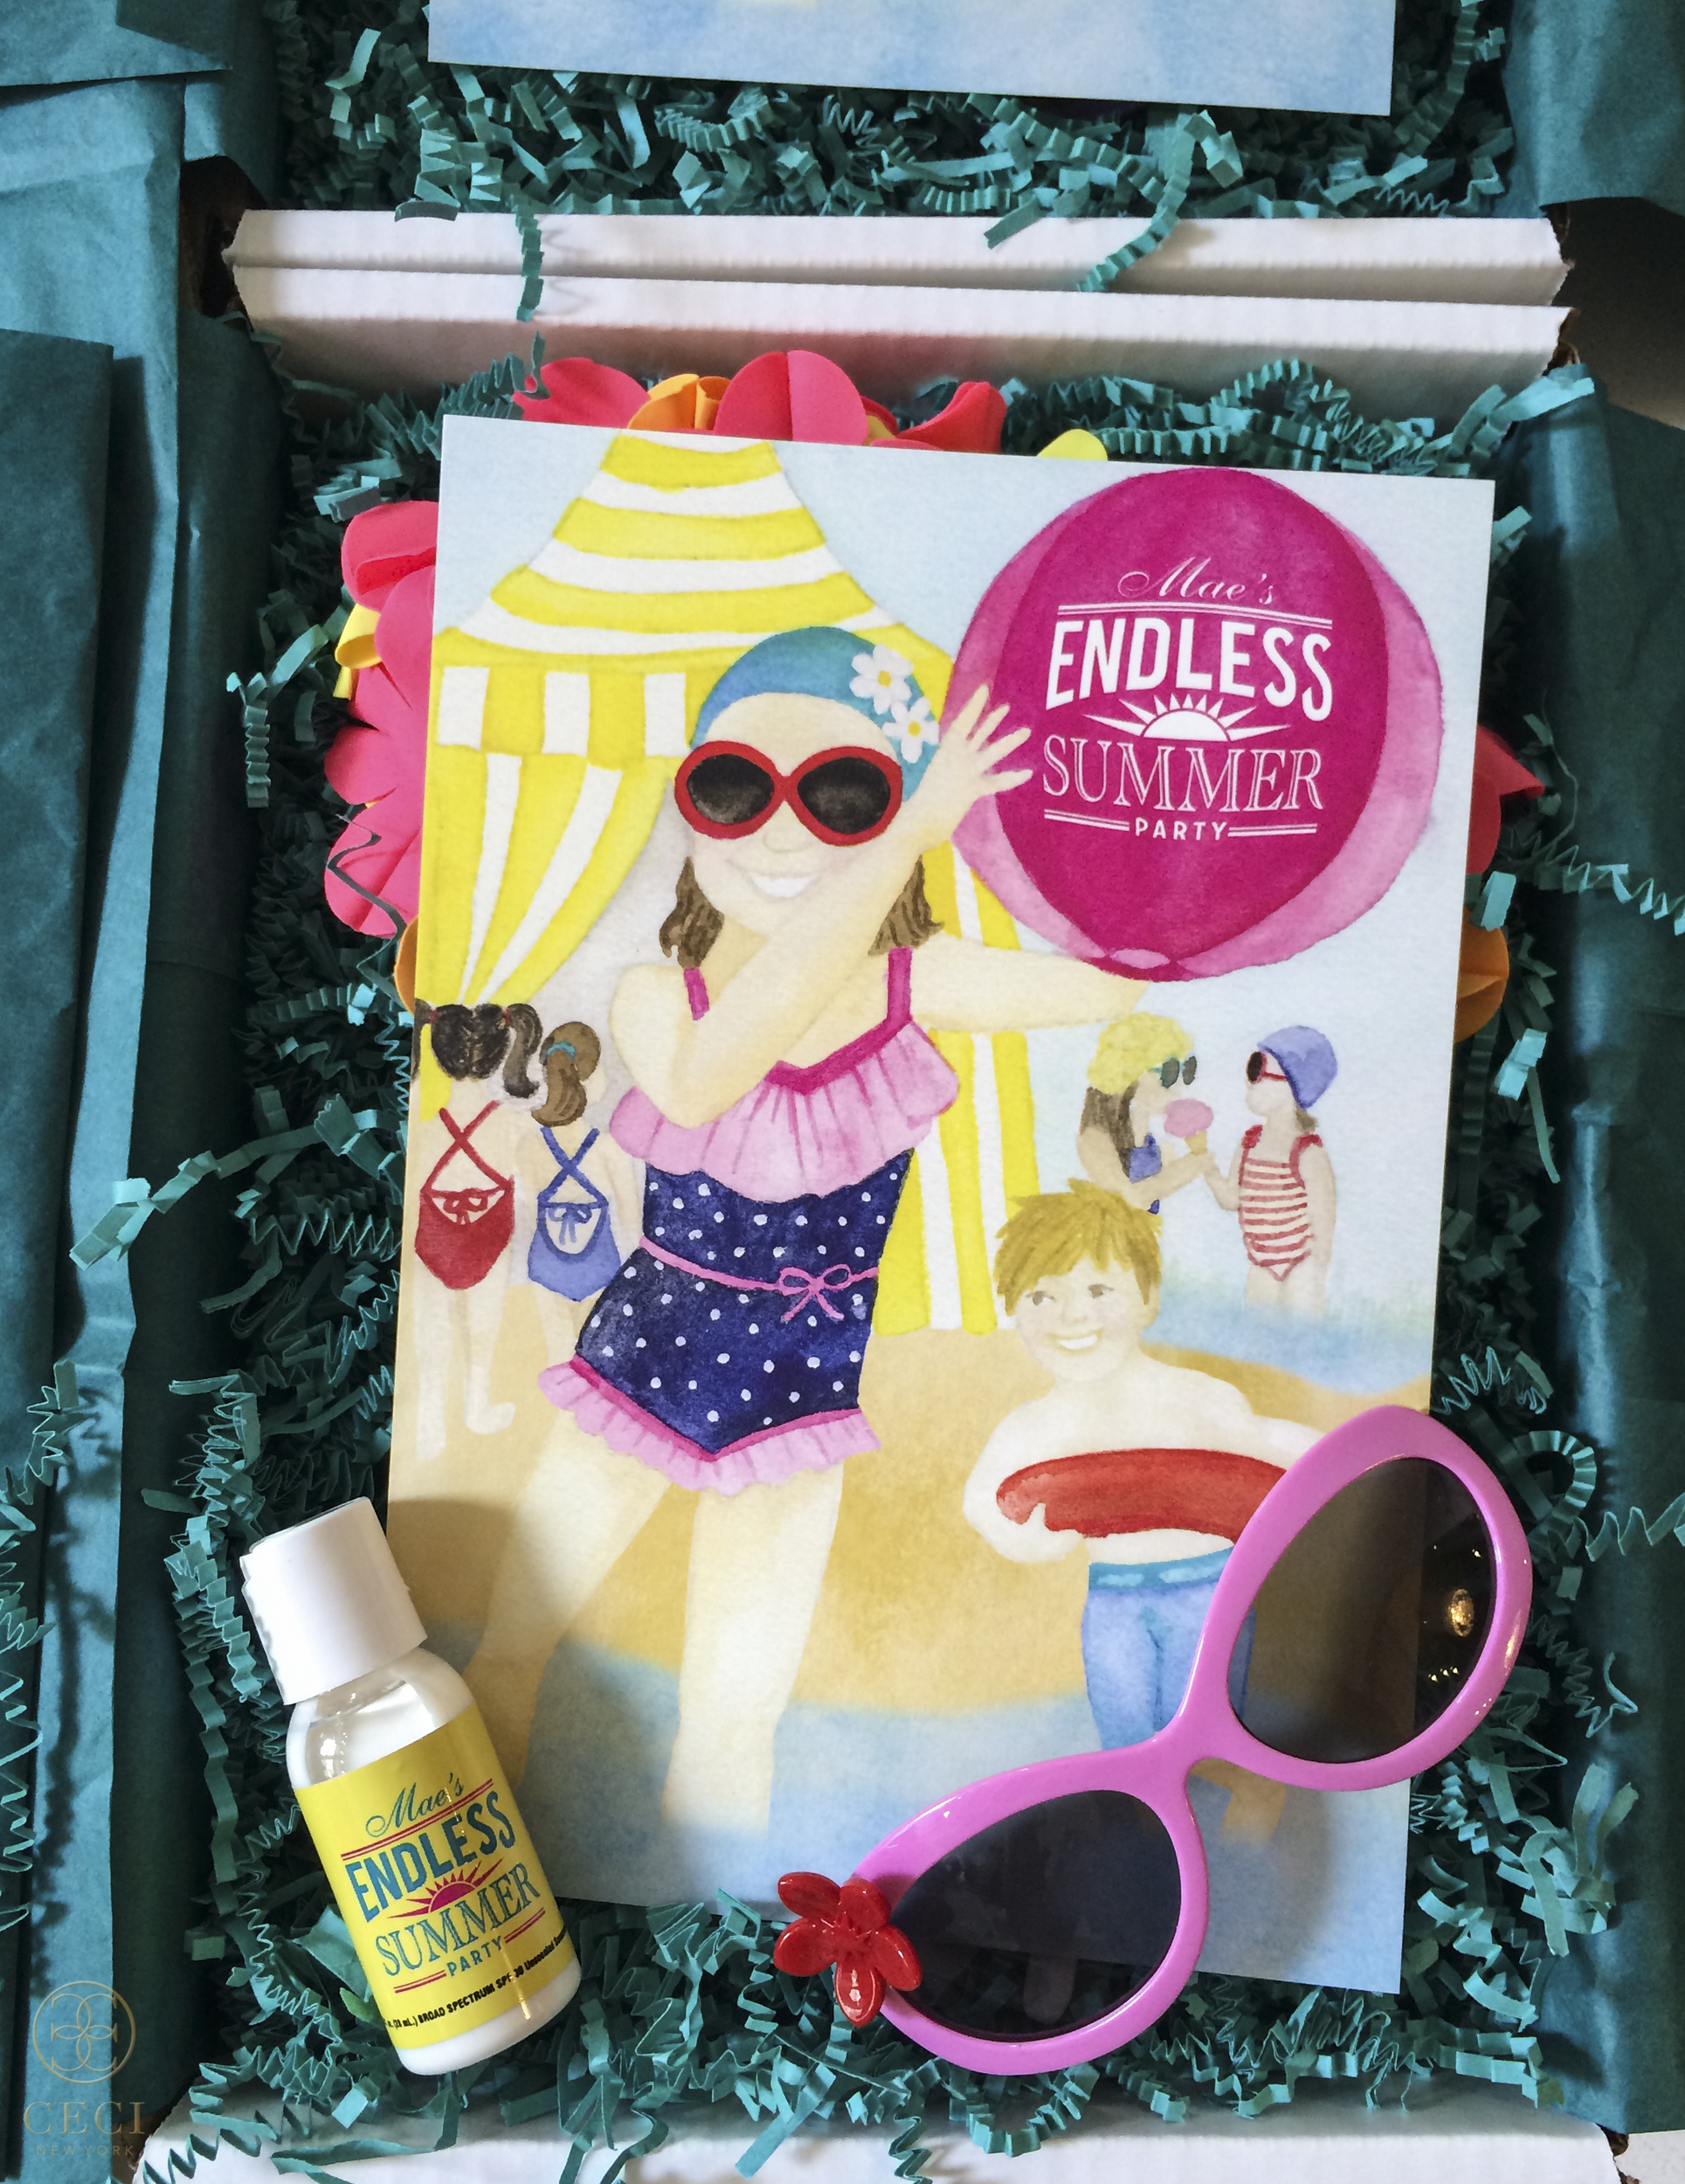 dallas_texas_birthday_party_mae_emily_clarke_events_kids_retro_pool_swim_endless_summer_invitations_ceci_new_york_watercolor_illustration_decor_design_boxes_favors-5.jpg